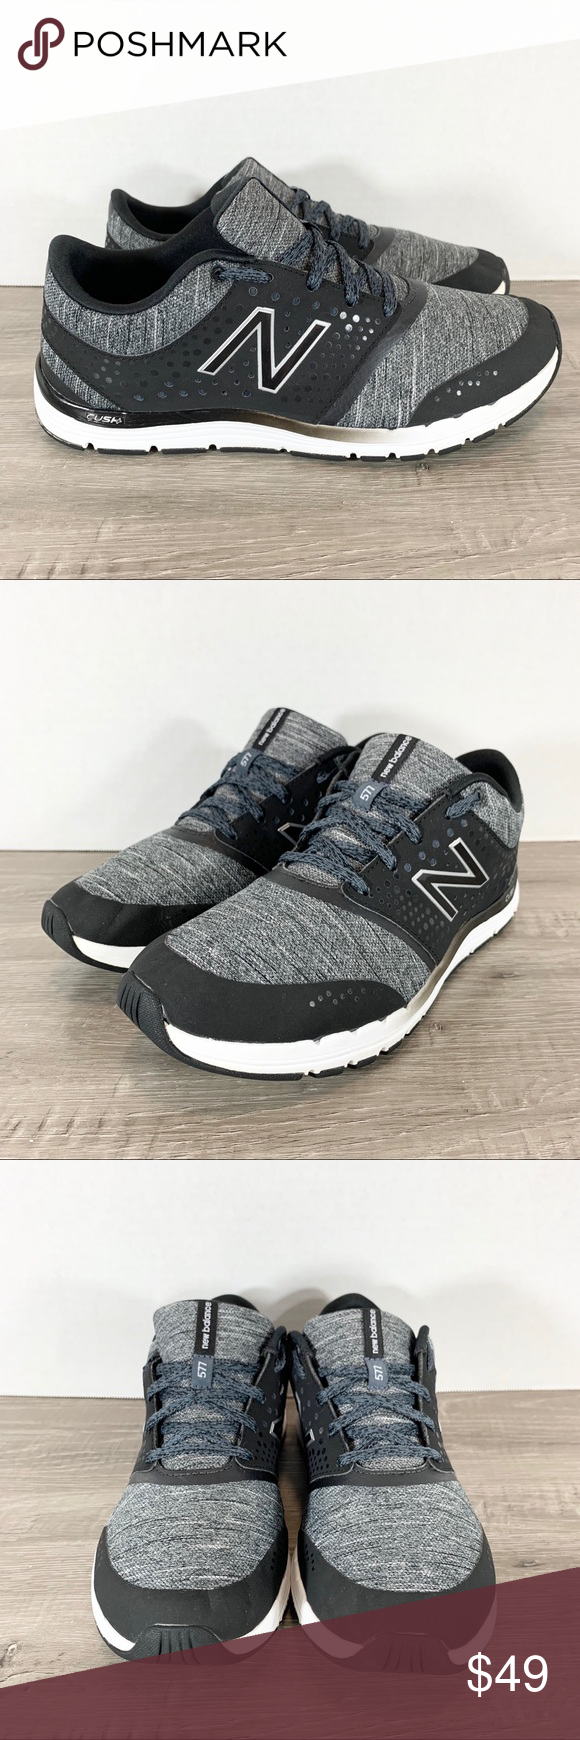 new balance 577v4